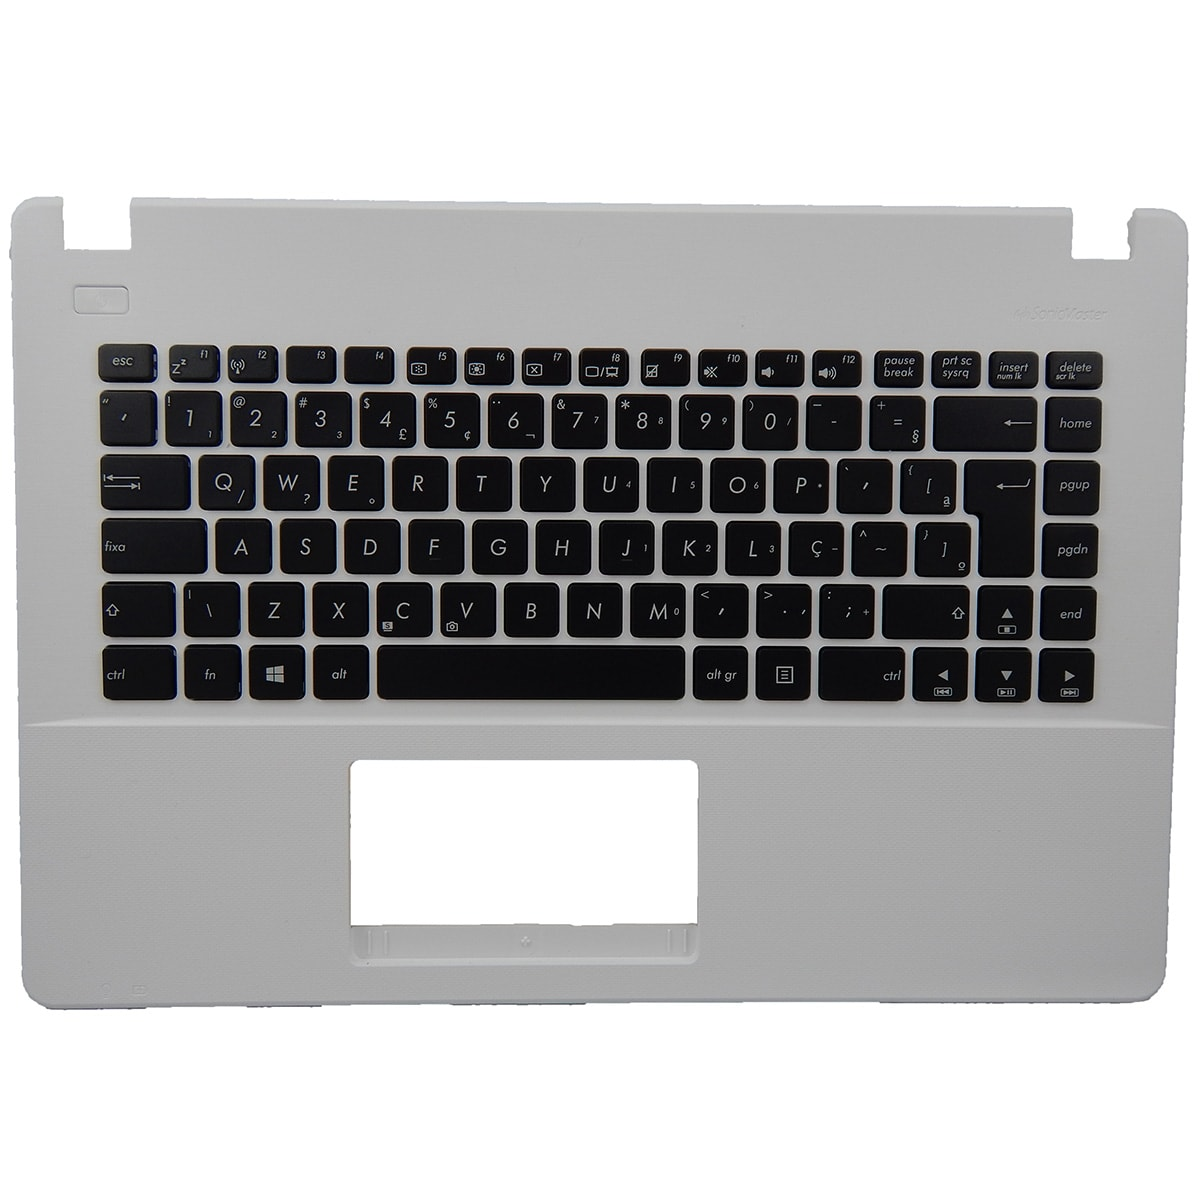 Teclado Ultrabook Asus X451ca/ma Preto c/ Moldura Branca Sem Touch Pn: MP-13K86PA-9203